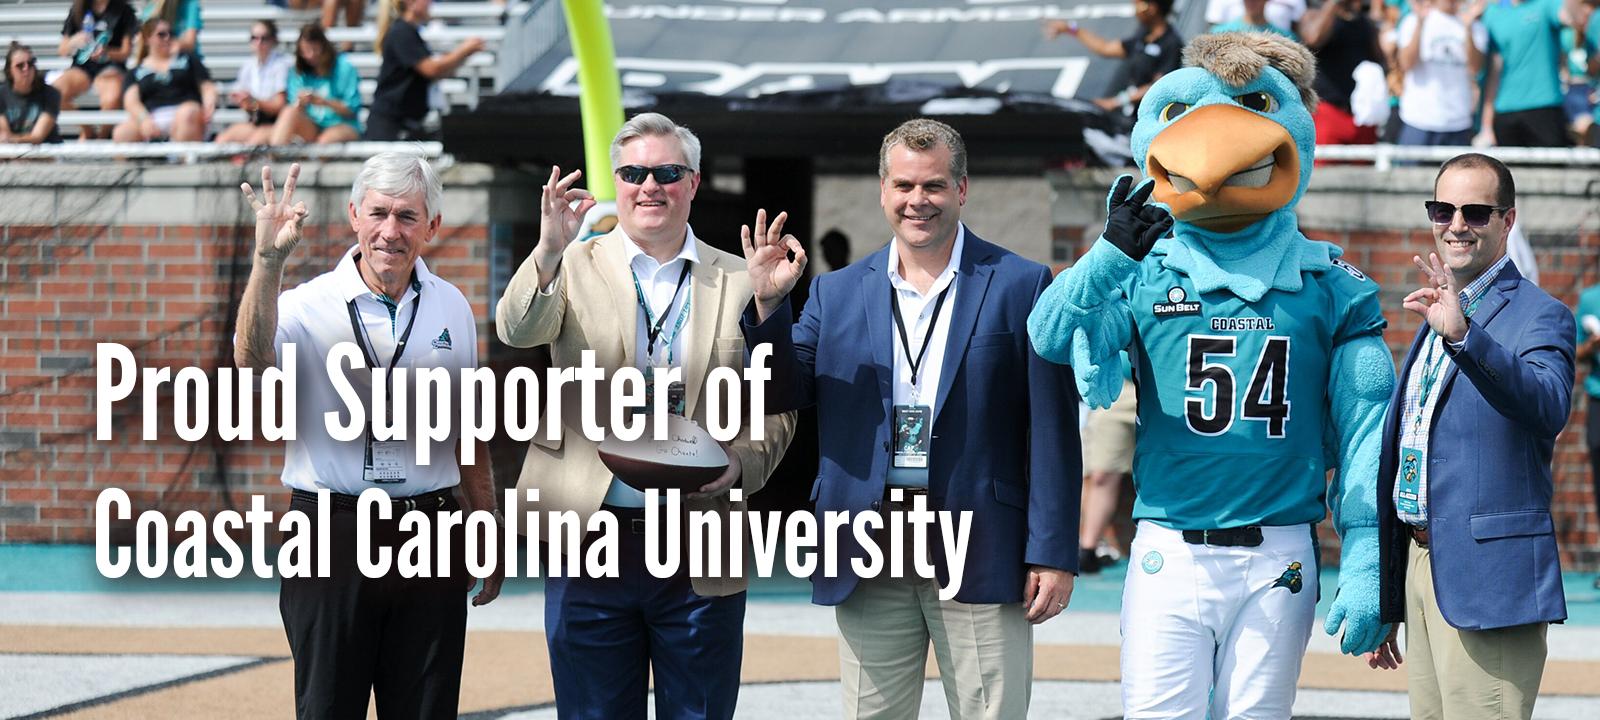 Coastal Carolina University Partnership